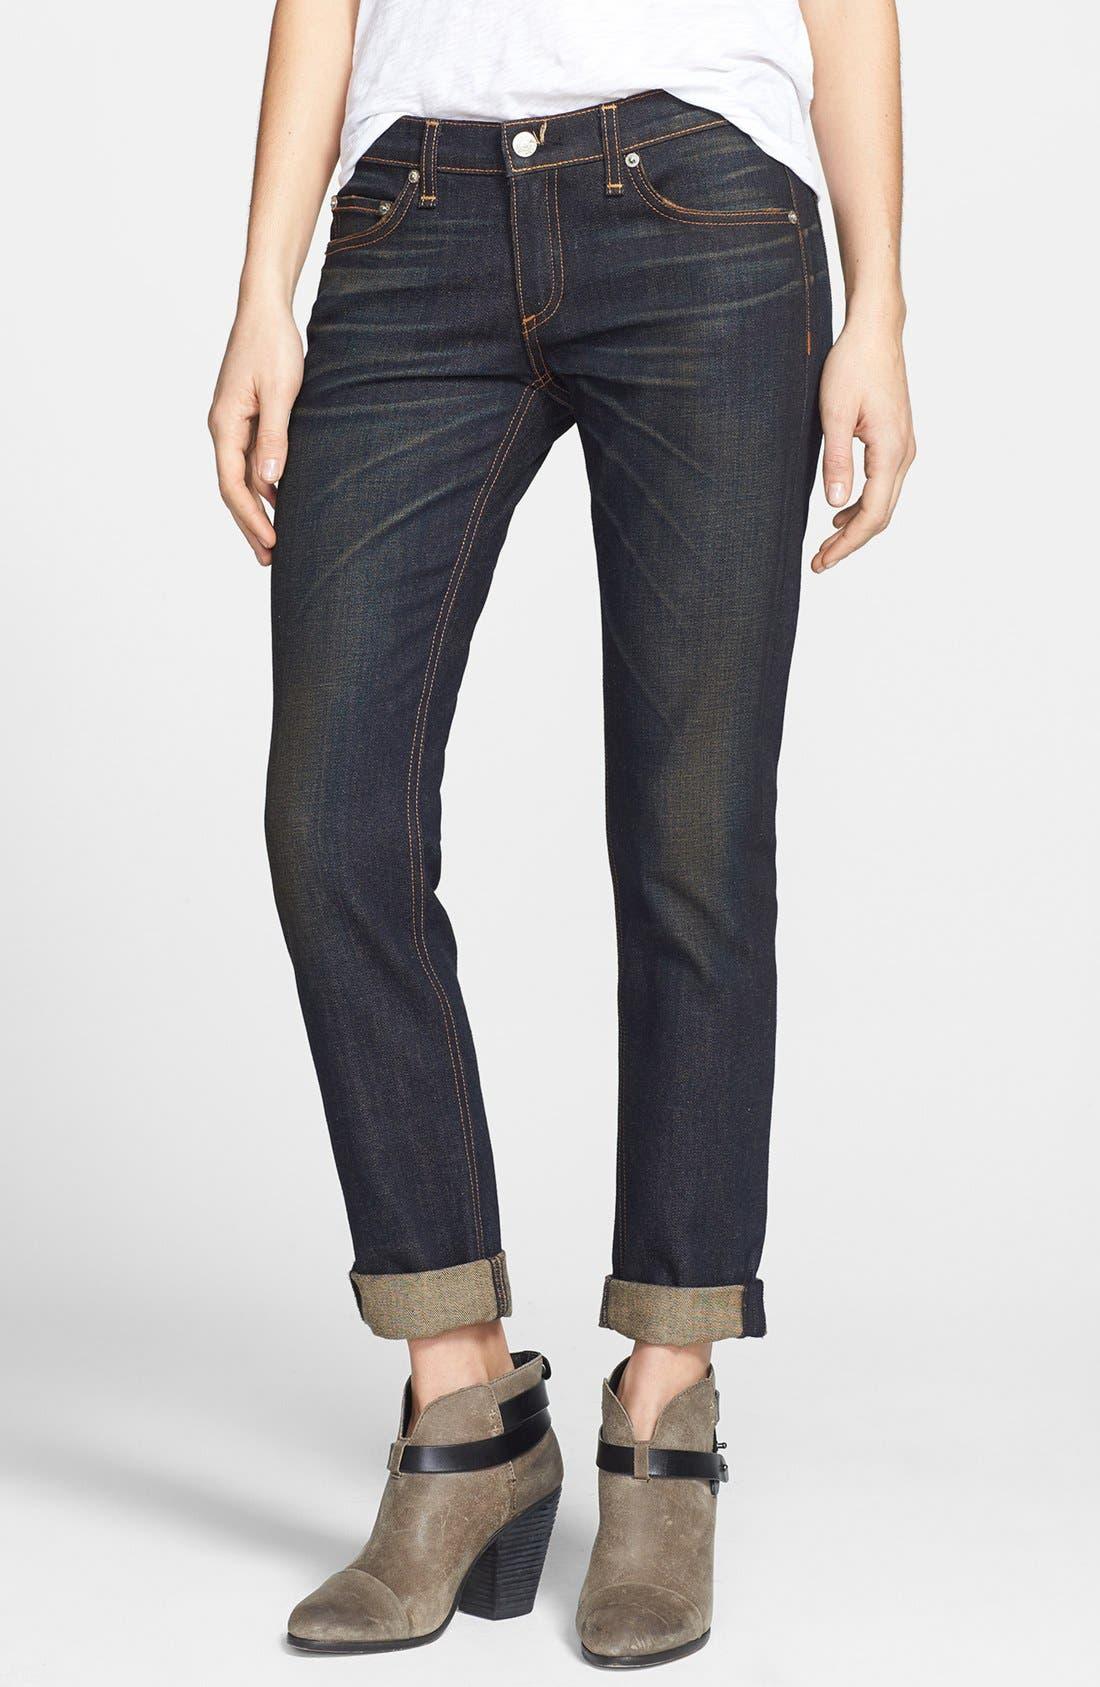 Main Image - rag & bone/JEAN 'The Dre' Slim Fit Boyfriend Jeans (Charing)